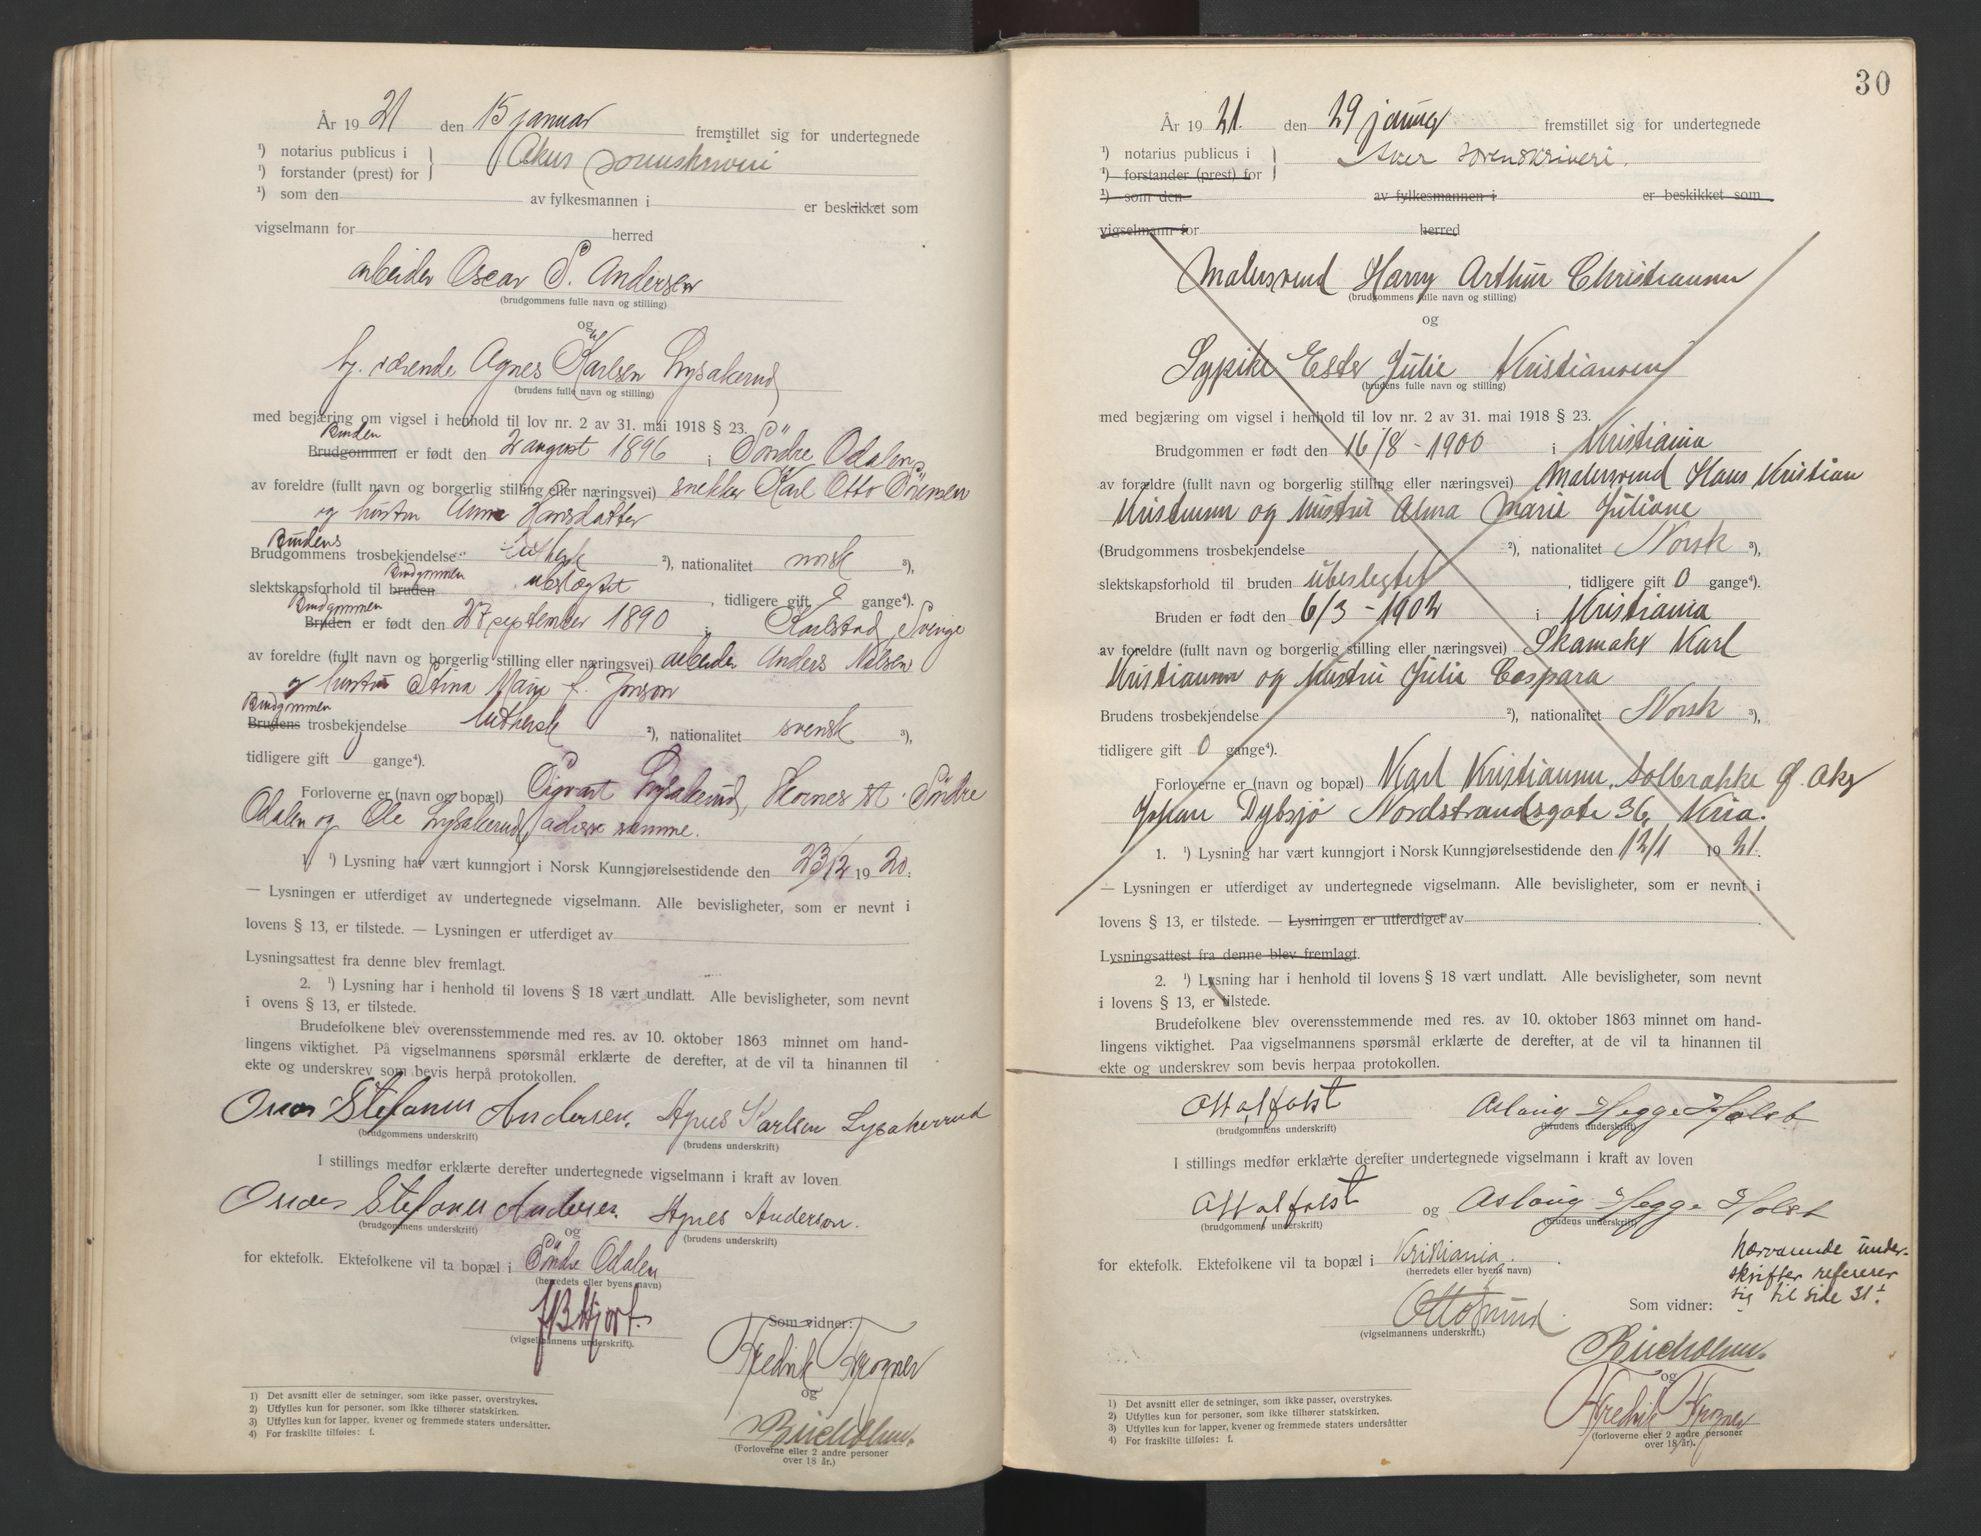 SAO, Aker sorenskriveri, L/Lc/Lcb/L0001: Vigselprotokoll, 1920-1922, s. 30